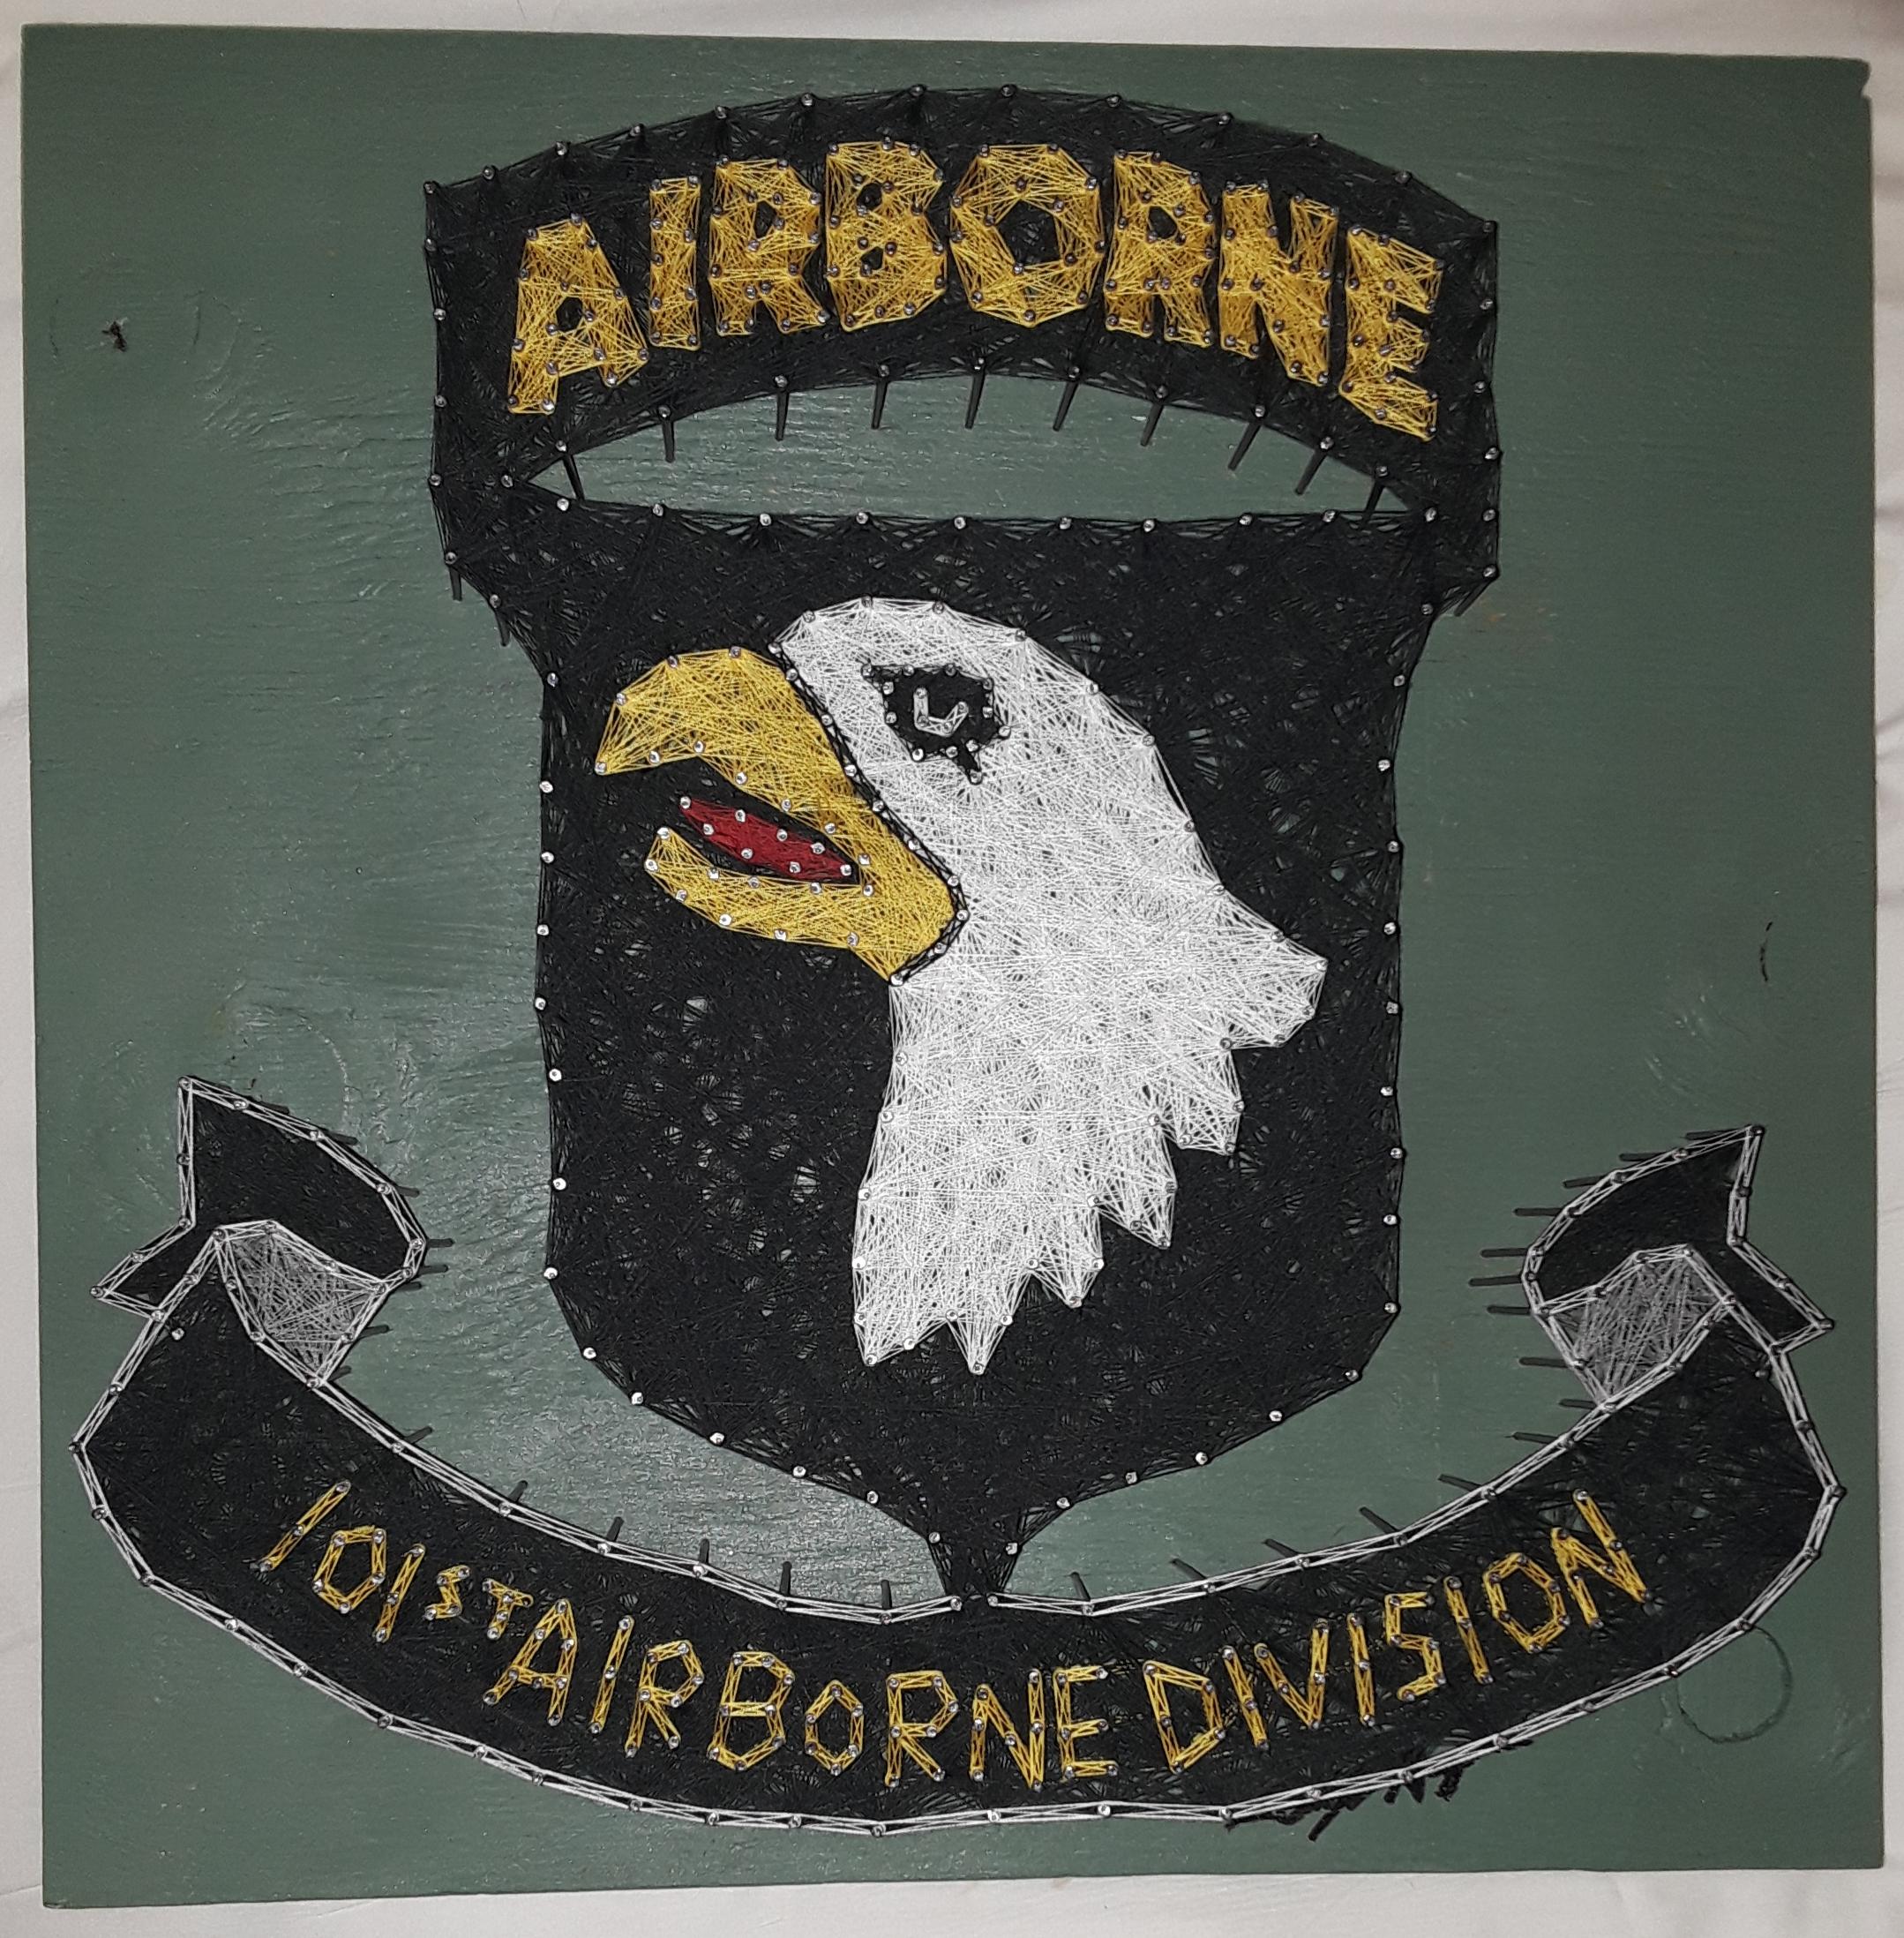 16x16 Airborne Army